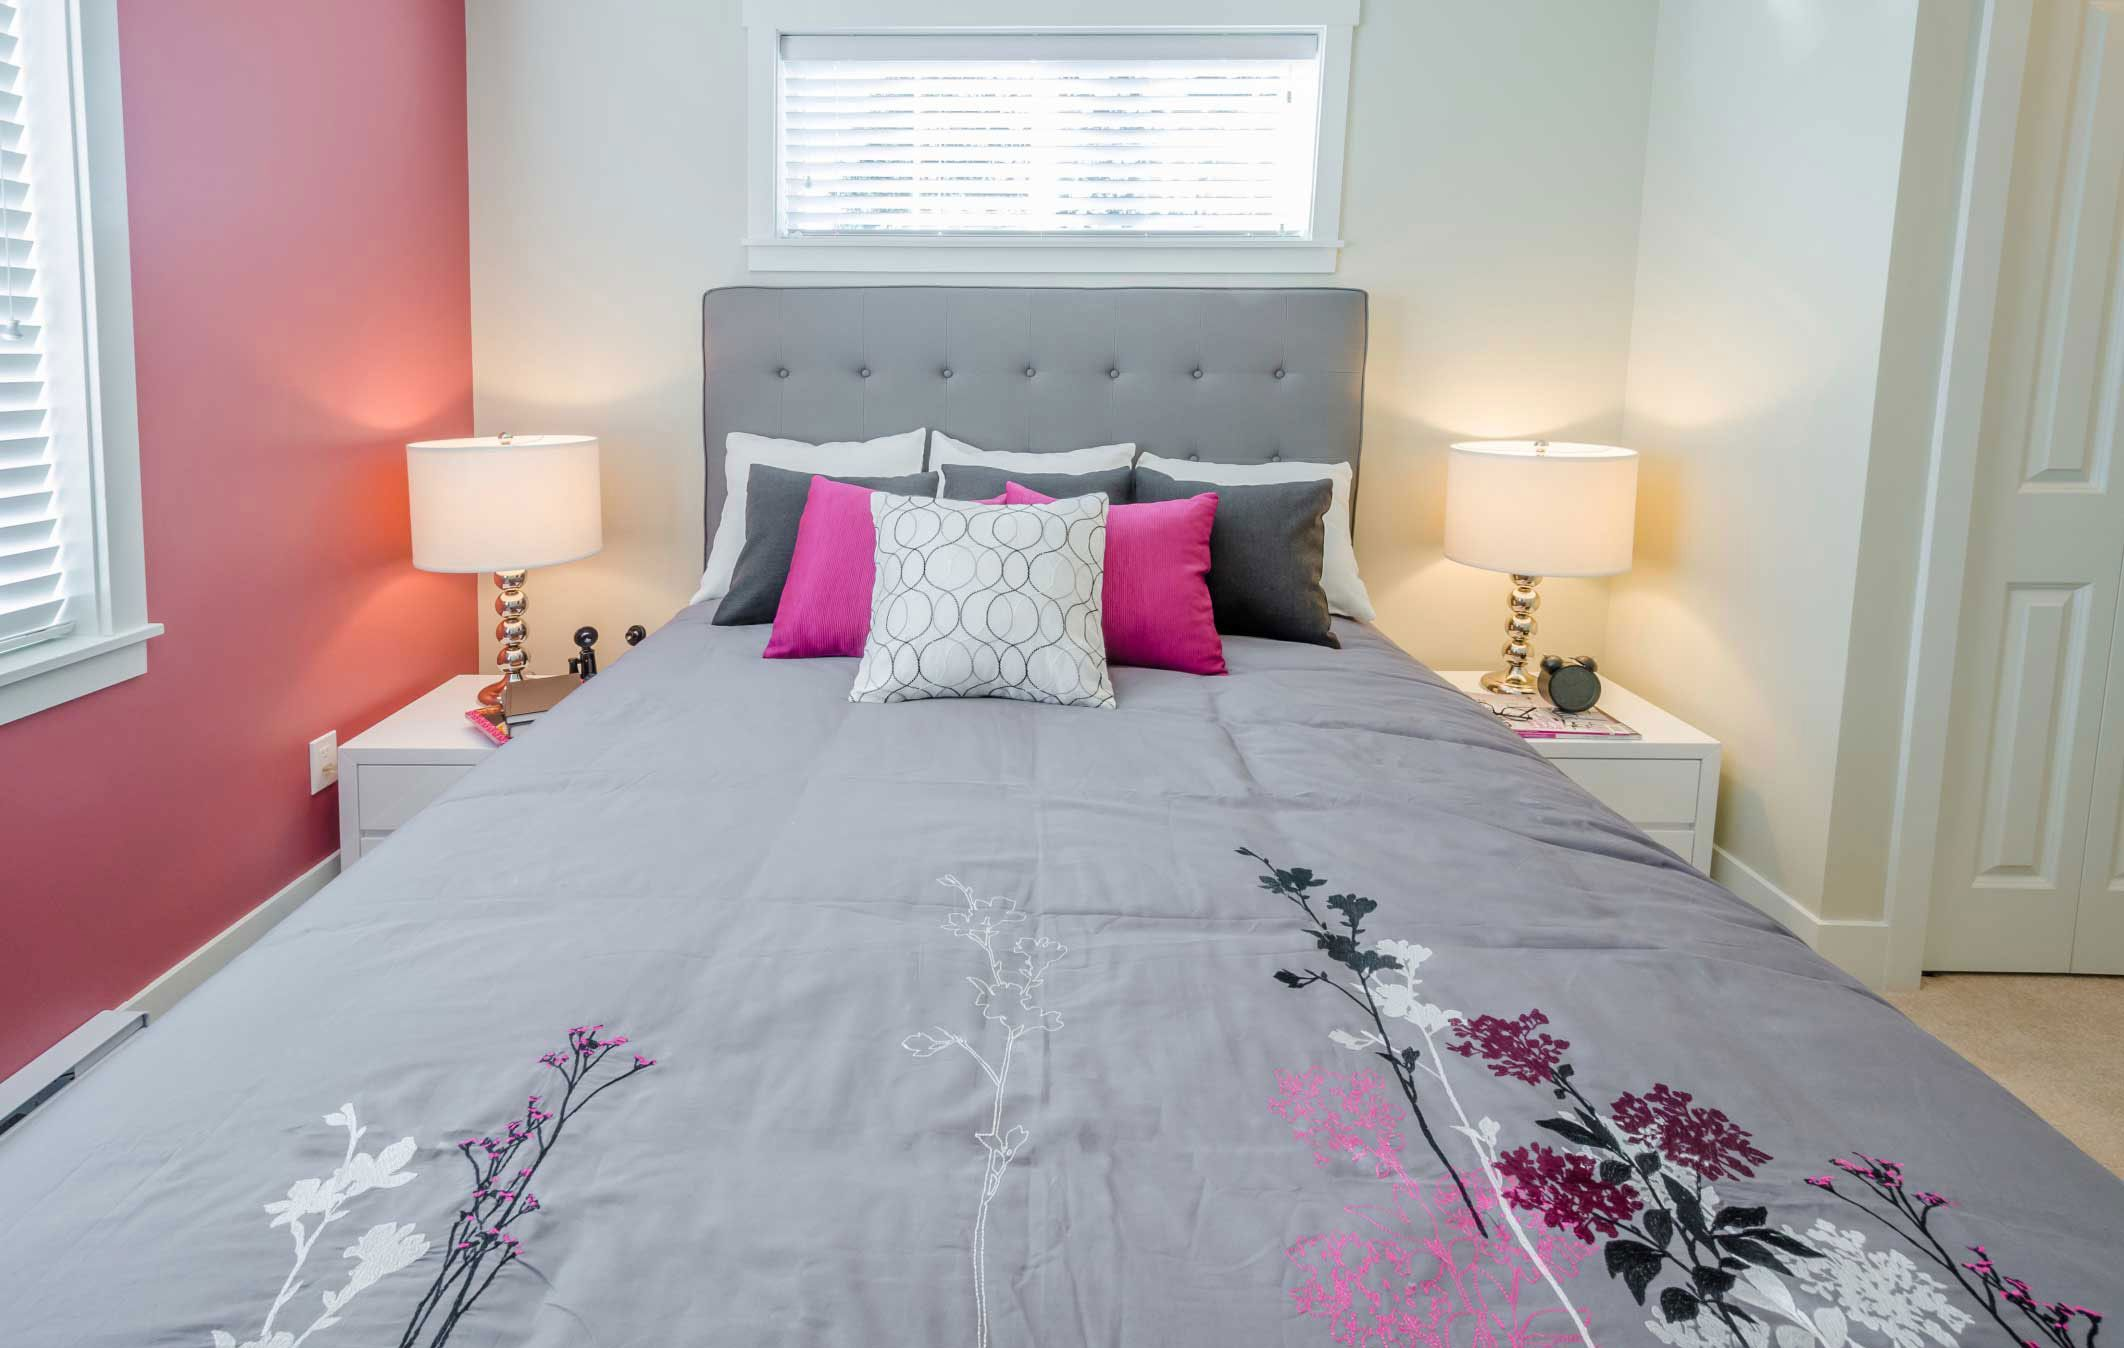 Chambre girly en rose, gris et blanc